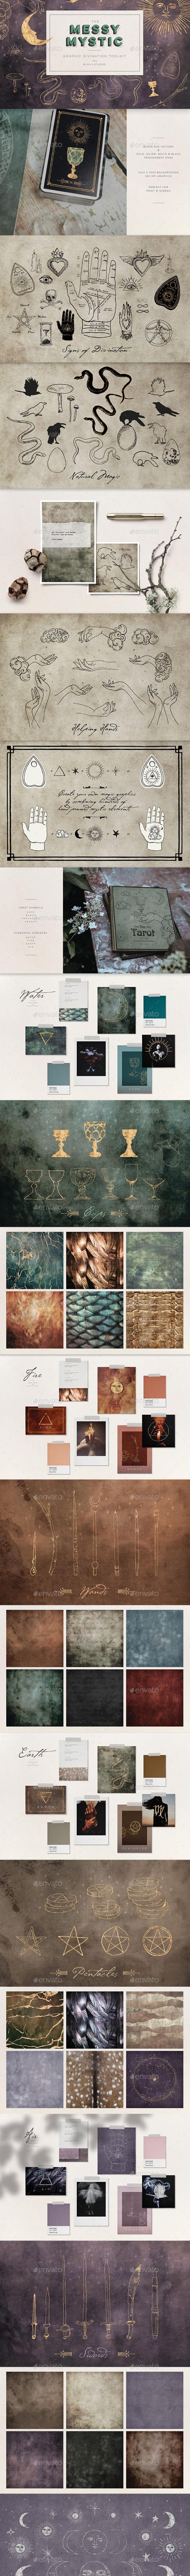 Mystic Digital Graphics Design Set - Astrology, Tarot, Witchcraft, Magic Icons, Textures & Vectors - Objects Illustrations